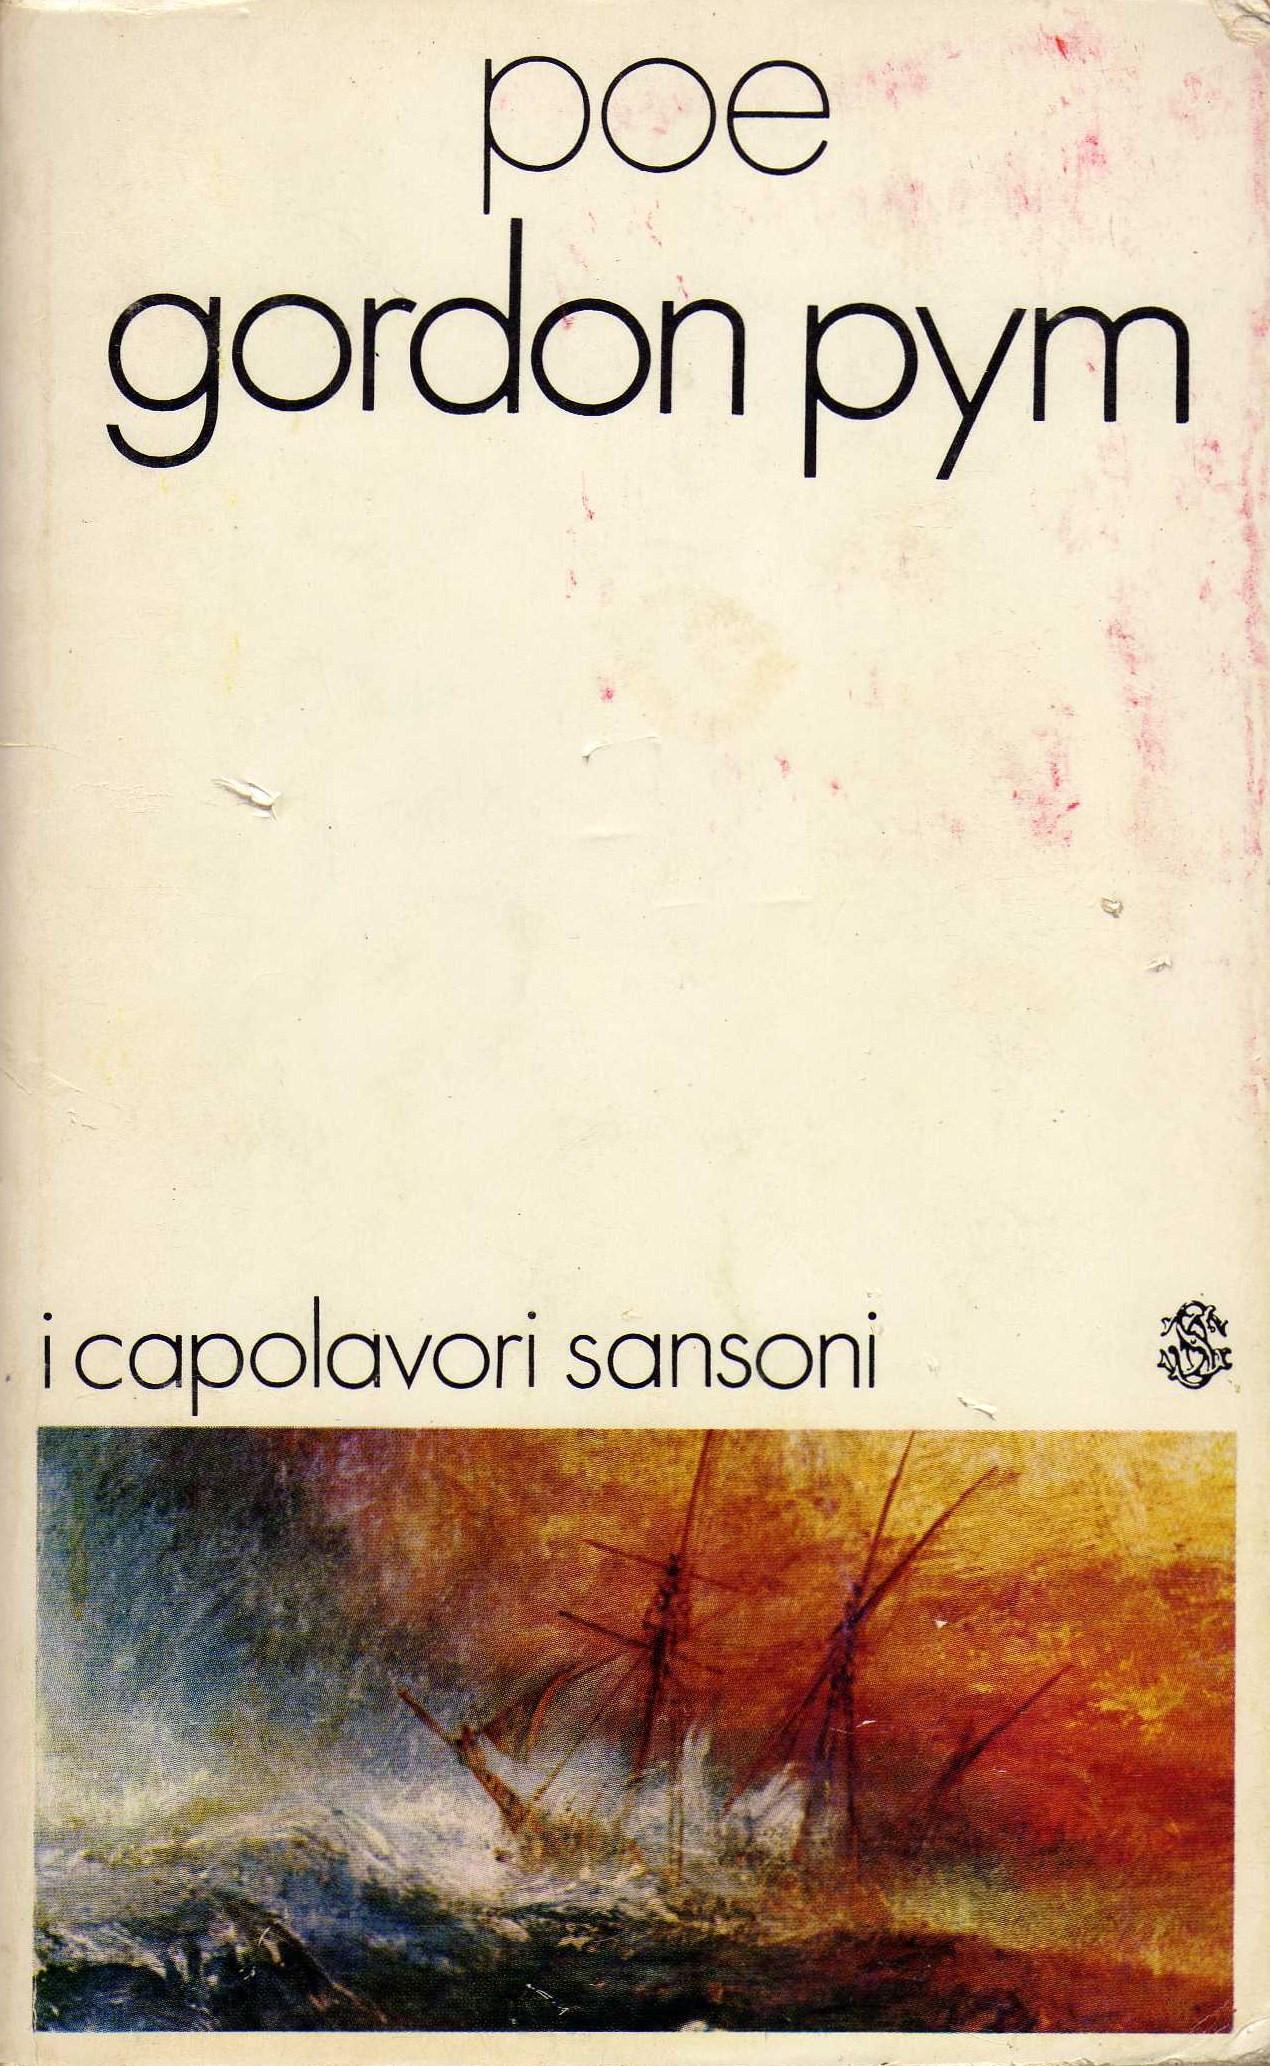 Gordon Pym - Racconti